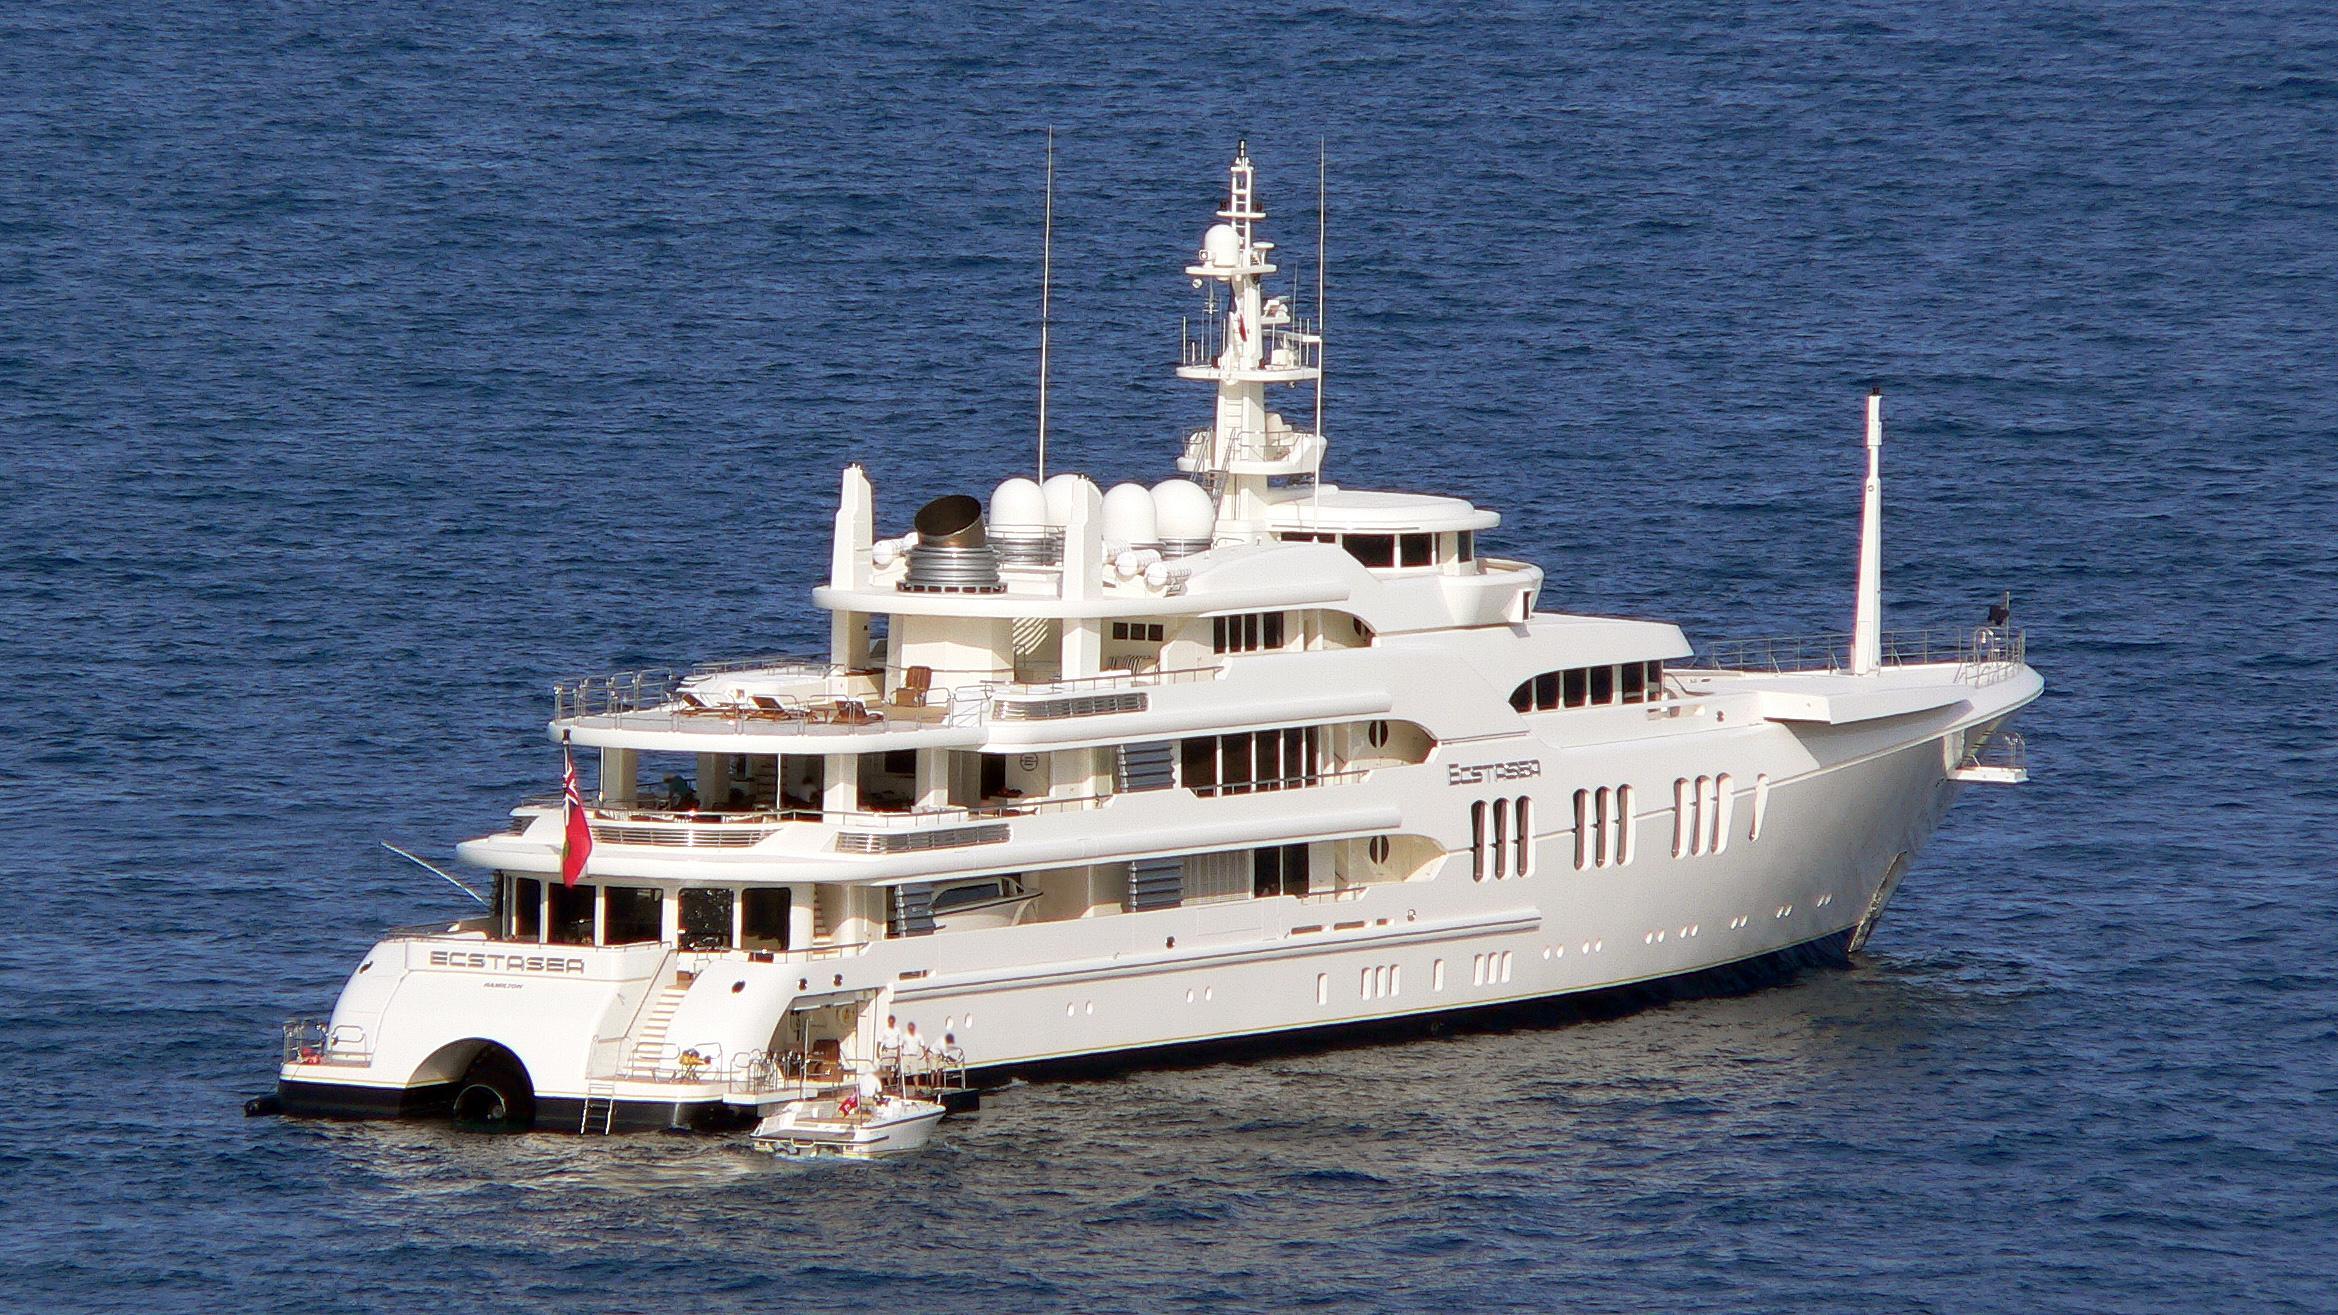 ecstasea-motor-yacht-feadship-2004-86m-stern